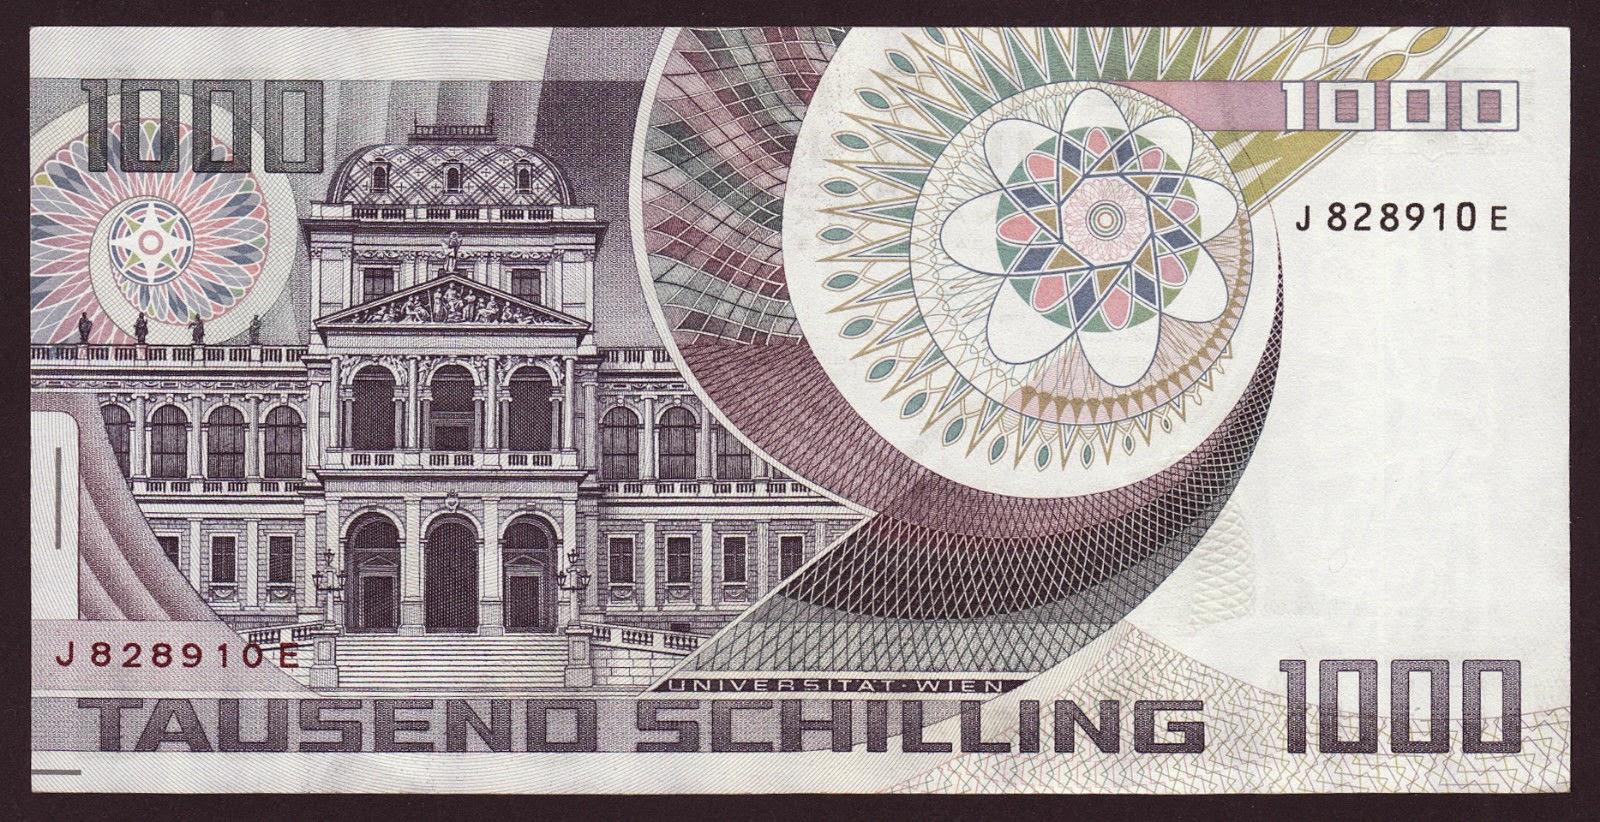 Austria Money Currency 1000 Schilling banknote 1983 University of Vienna